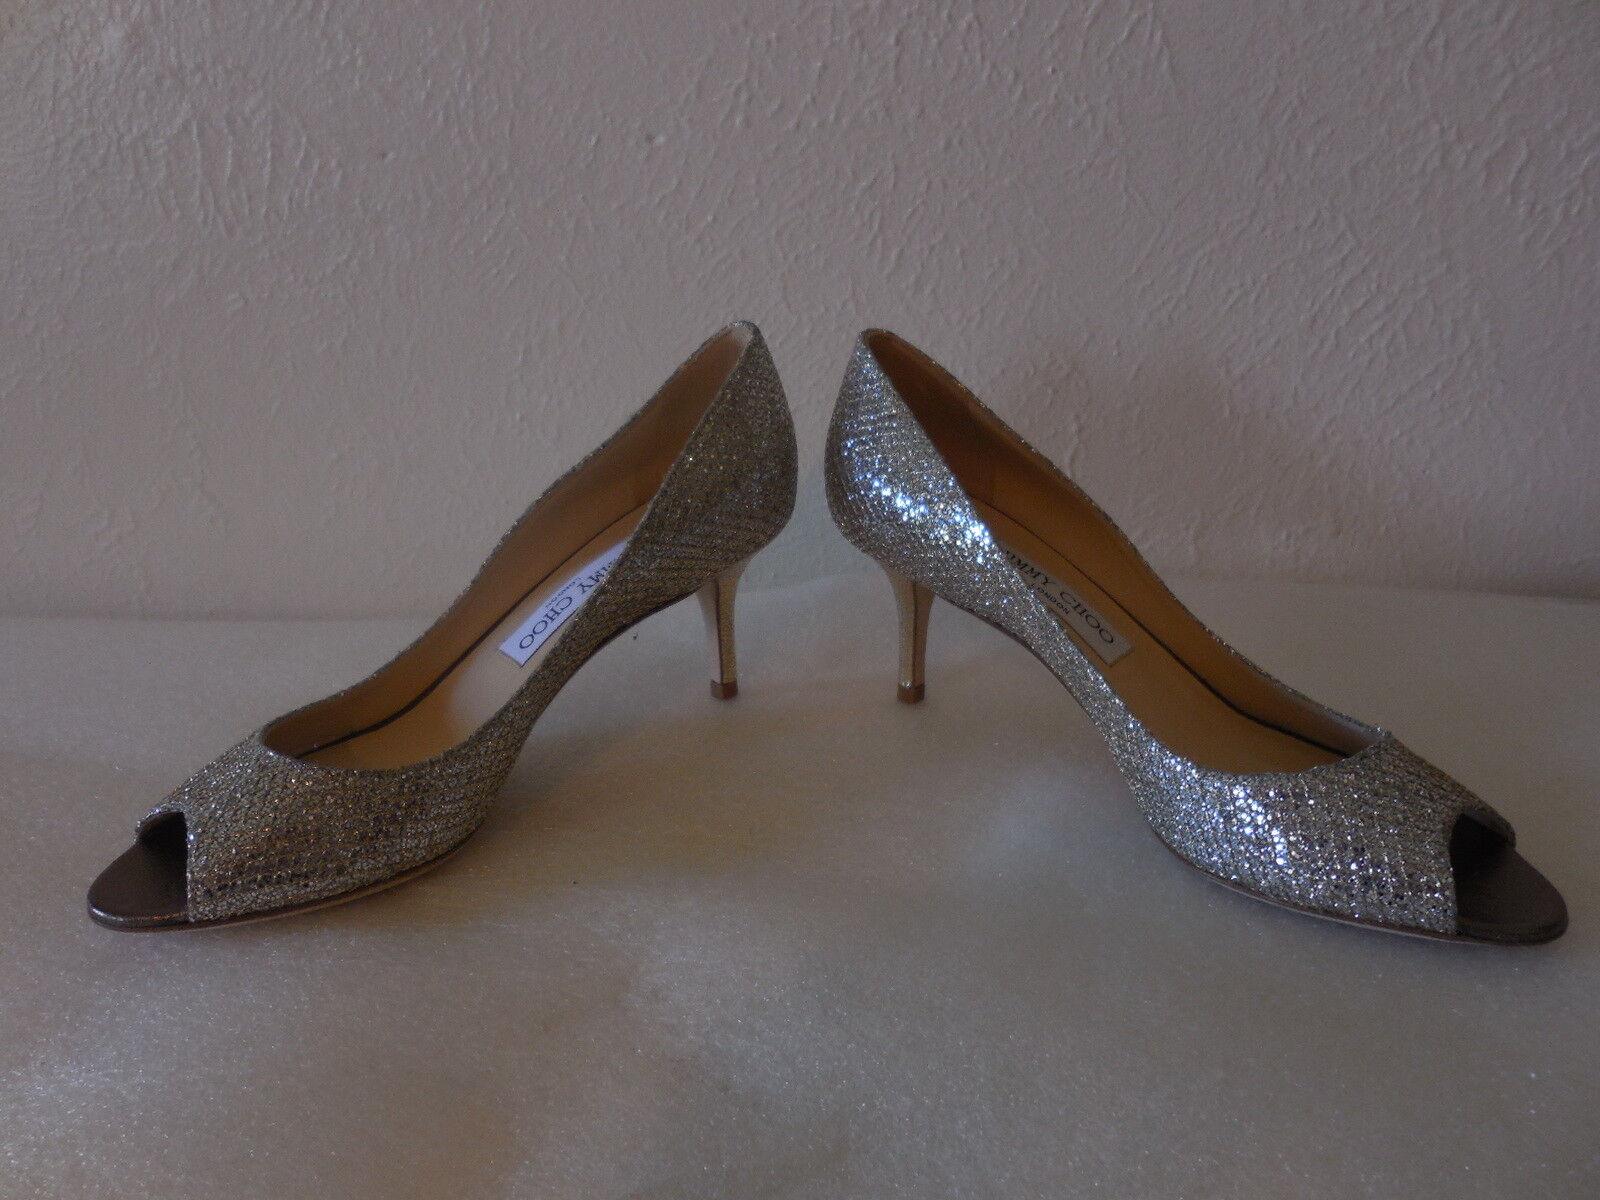 $595 NEW Sz. 6.5 Fabric Jimmy Choo ISABEL Champagne Glitter Fabric 6.5 Open Toe Pump schuhe caa9f0